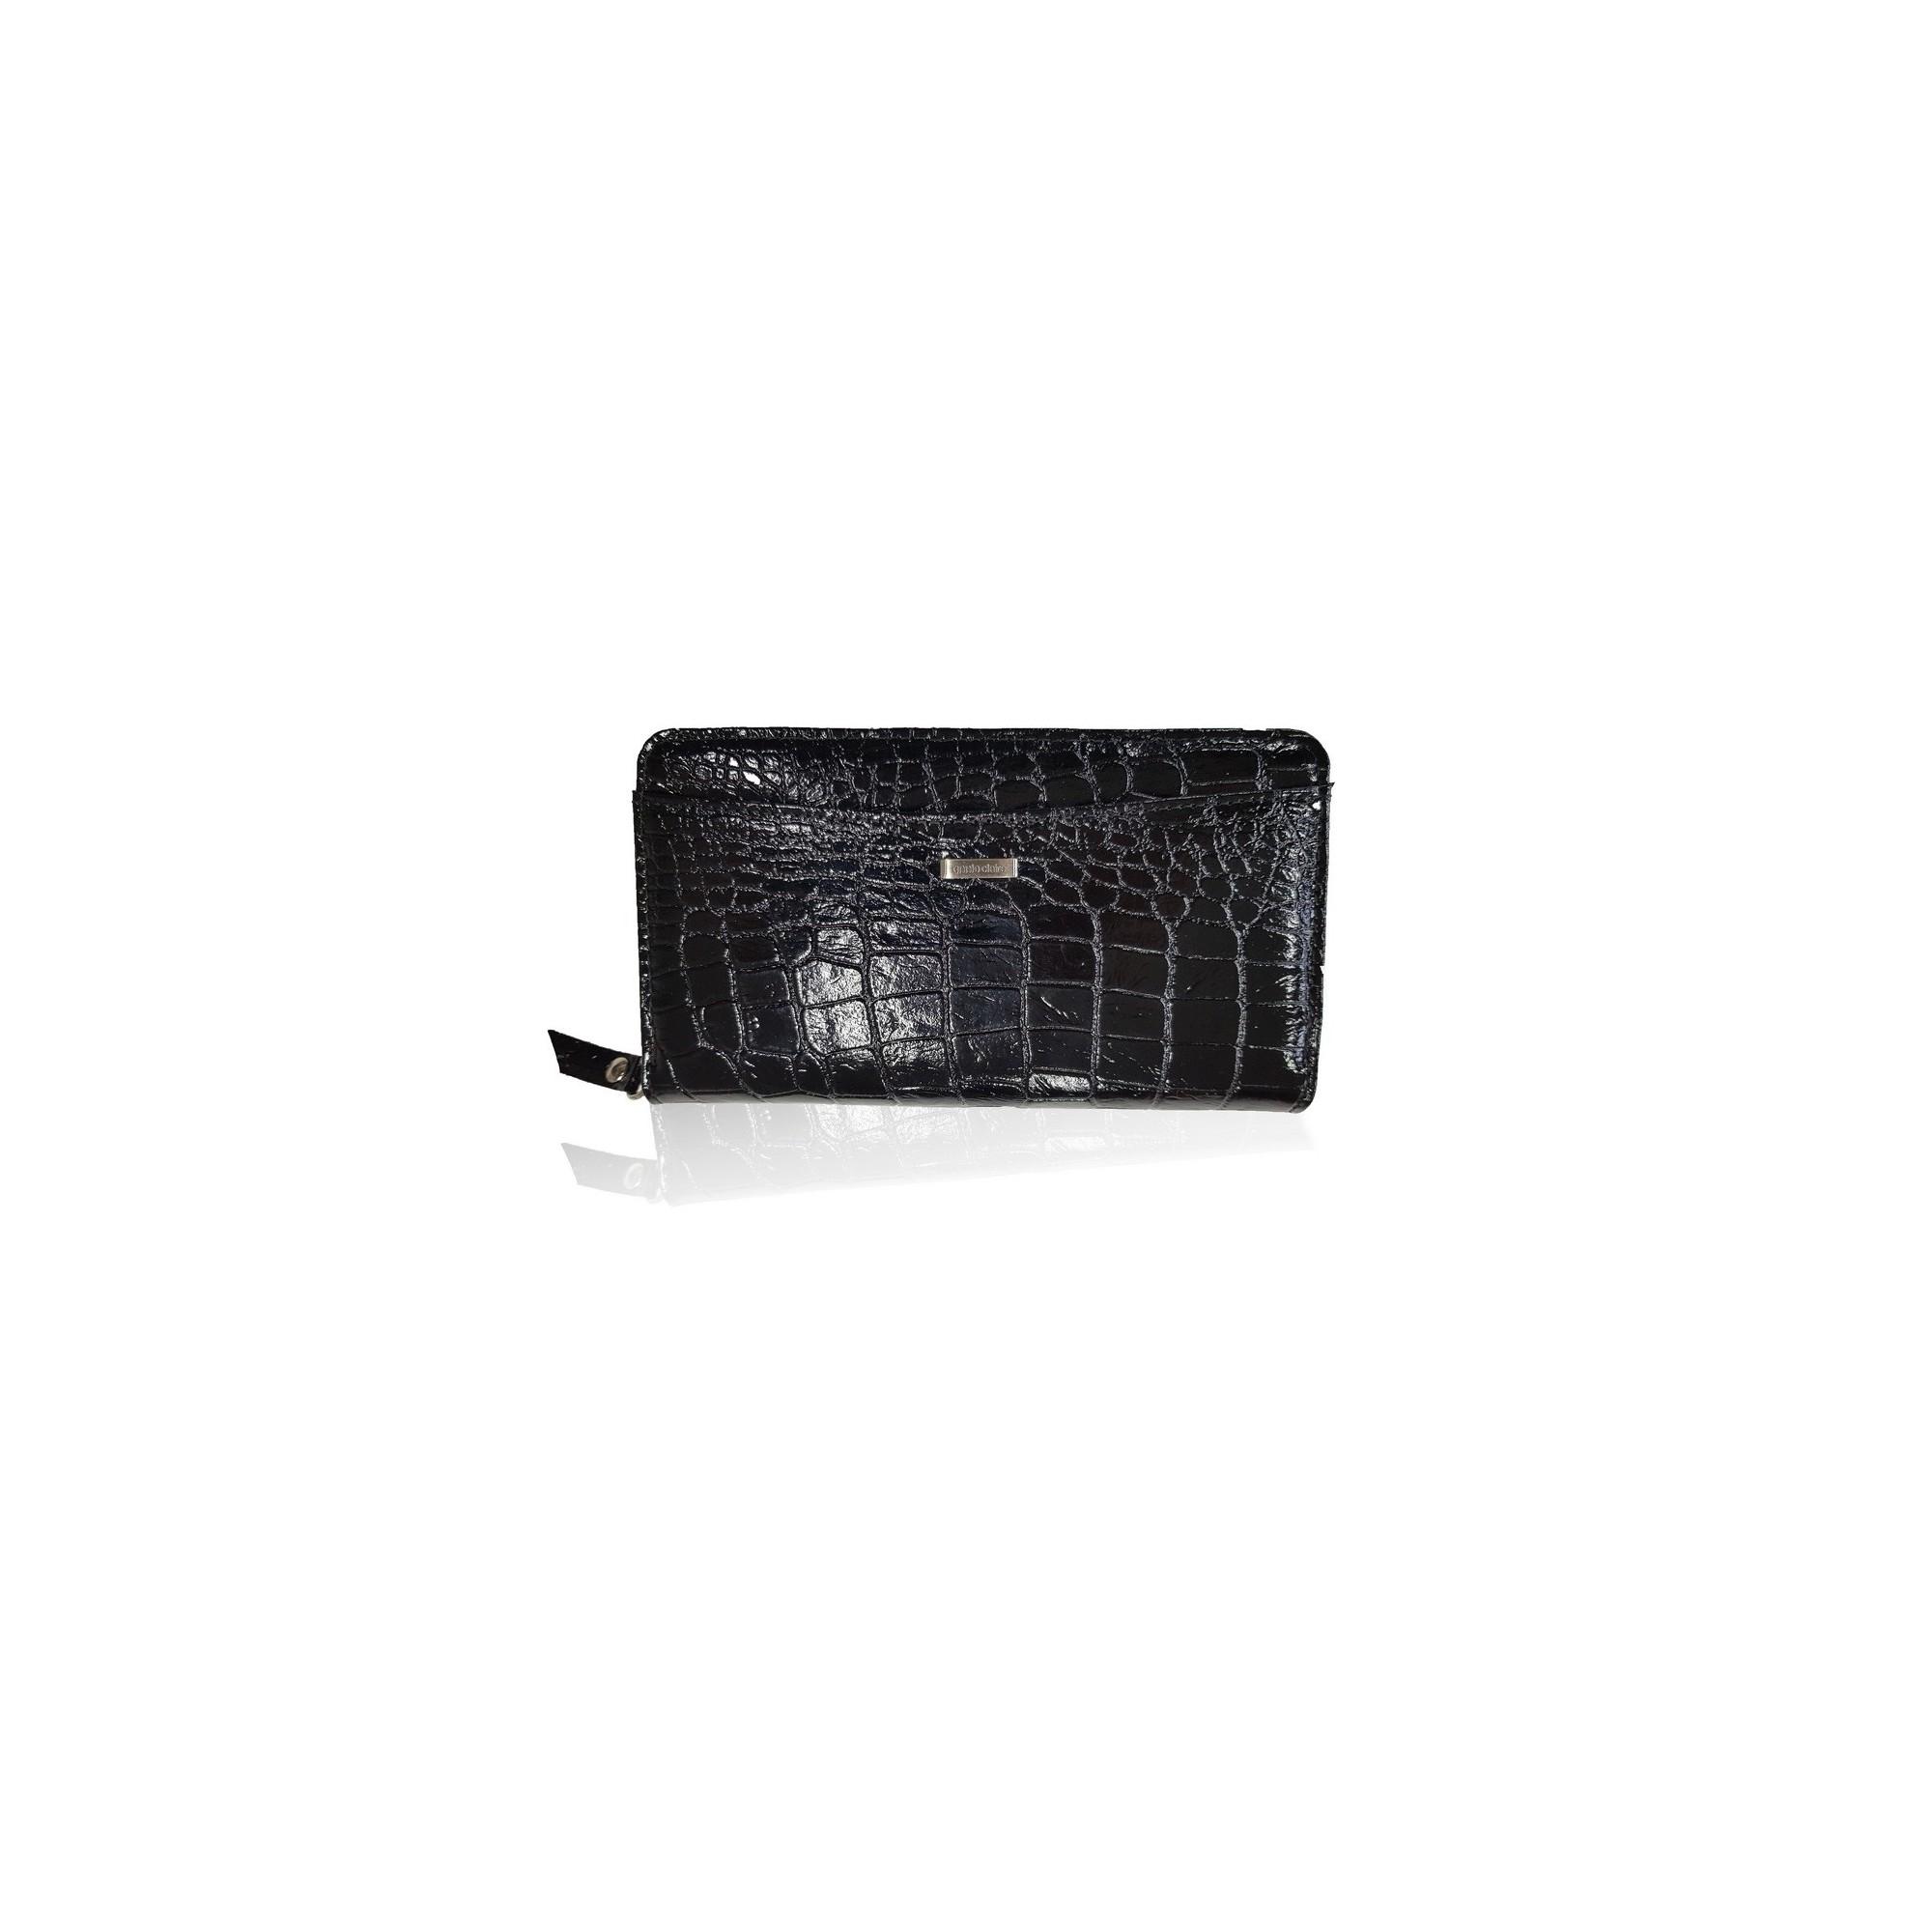 Dámska peňaženka, kroko, čierny lak